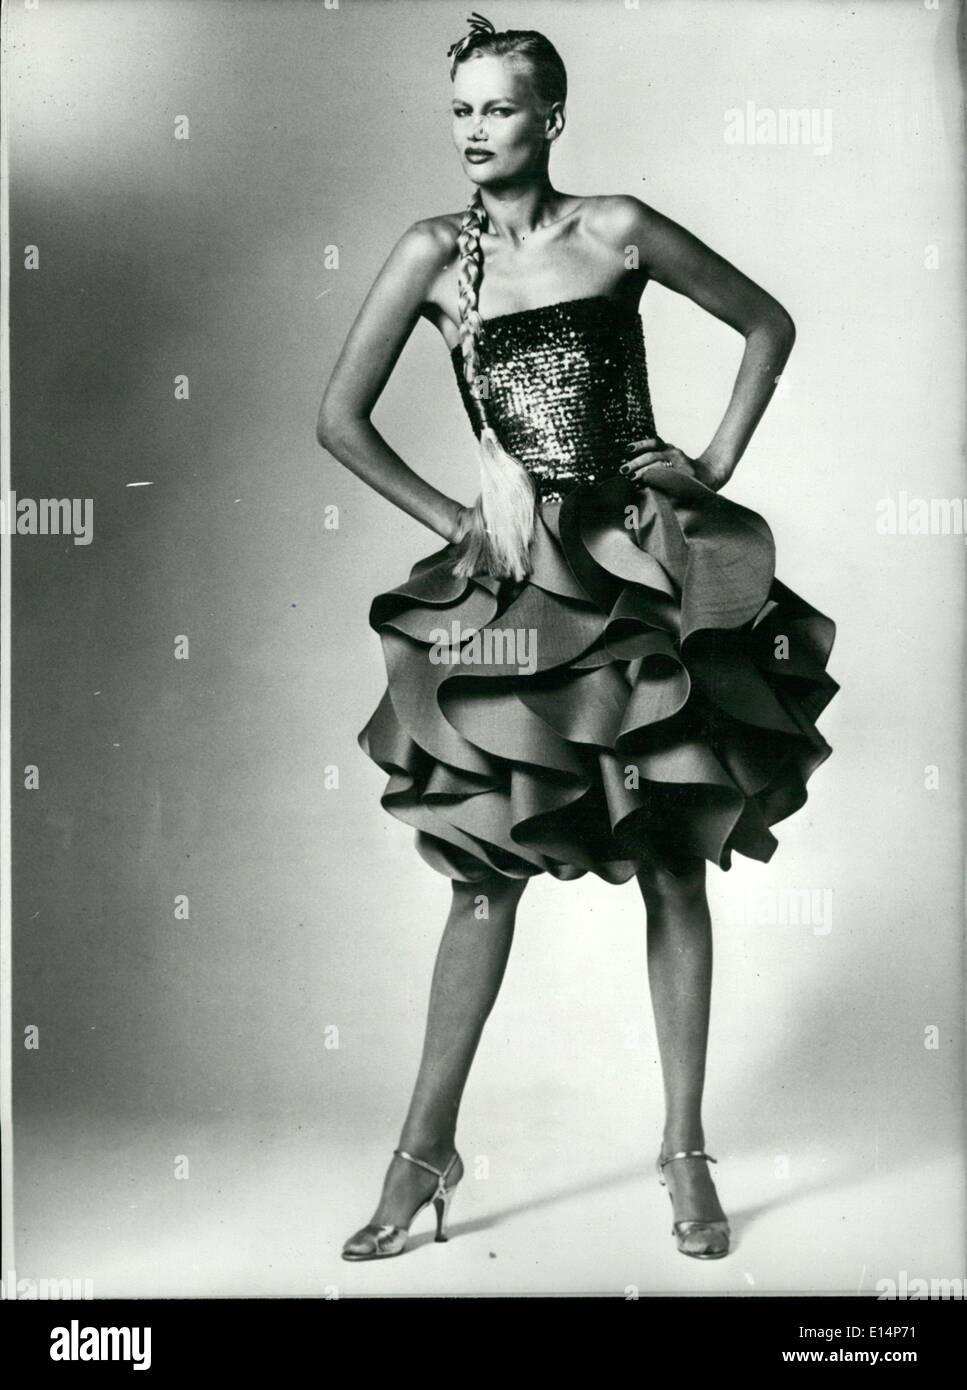 Apr. 12, 2012 - Cocktail Dress by Kimijima Designs - Stock Image